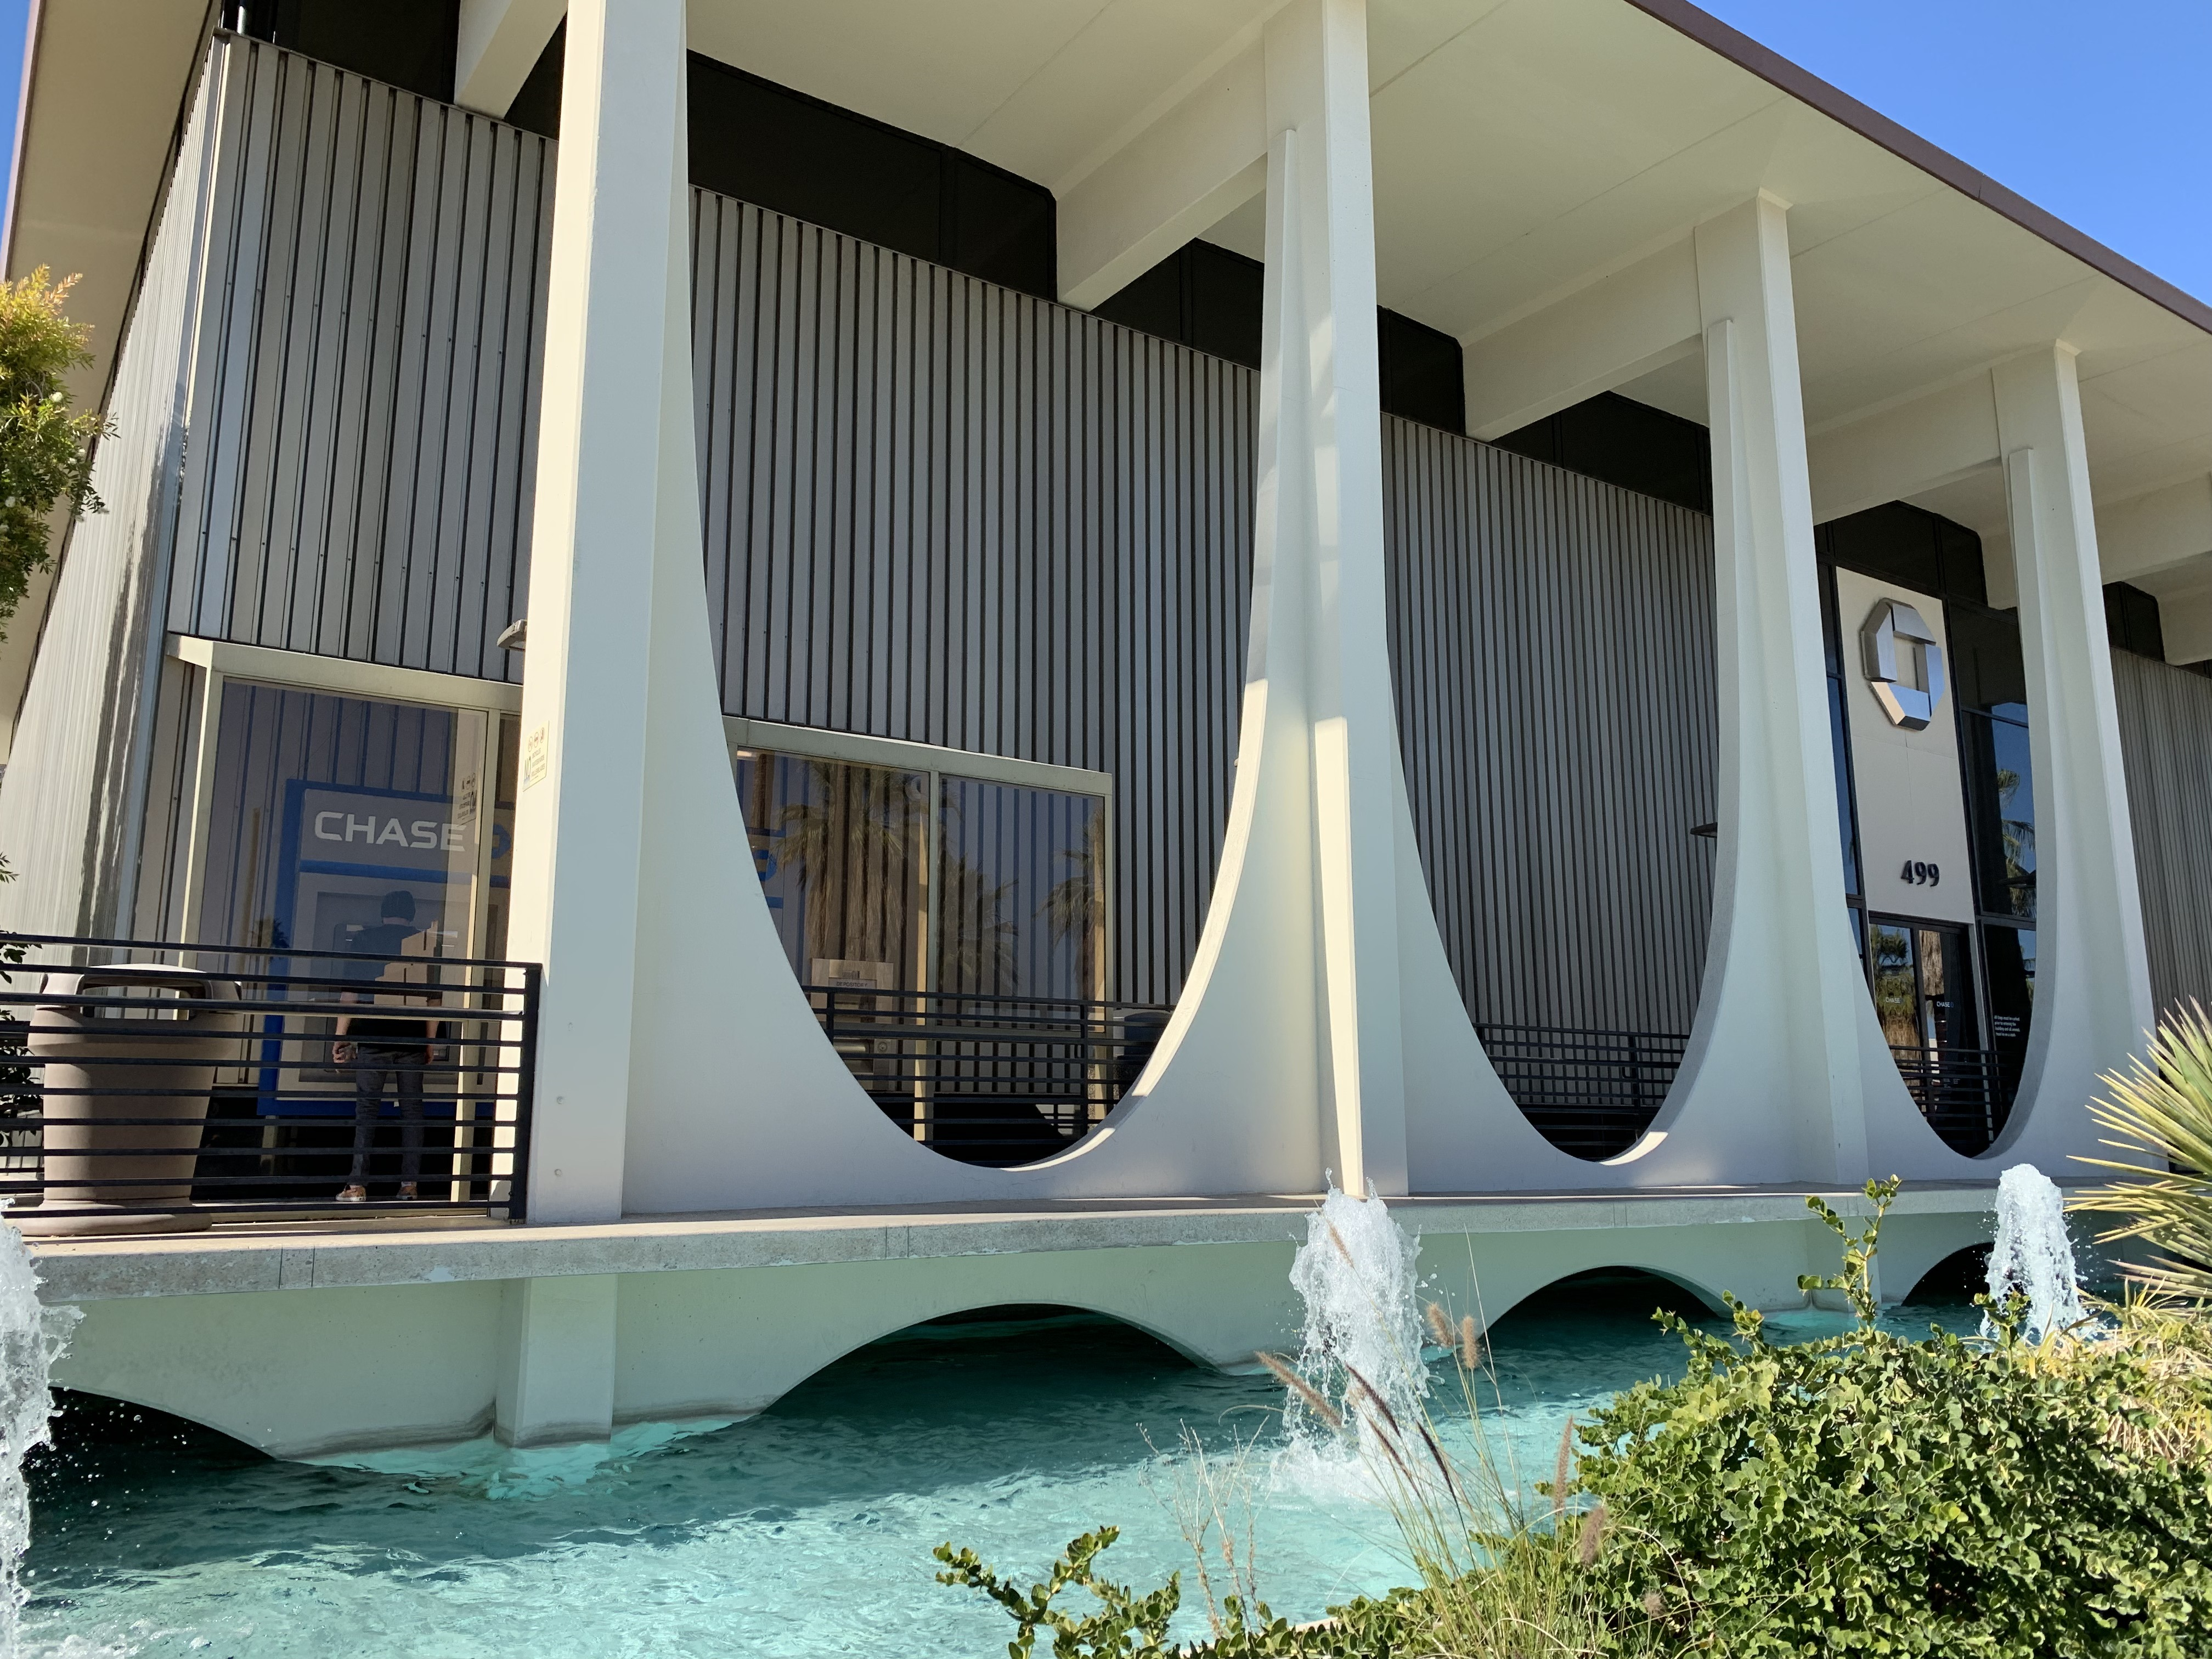 coachella valley savings and loan